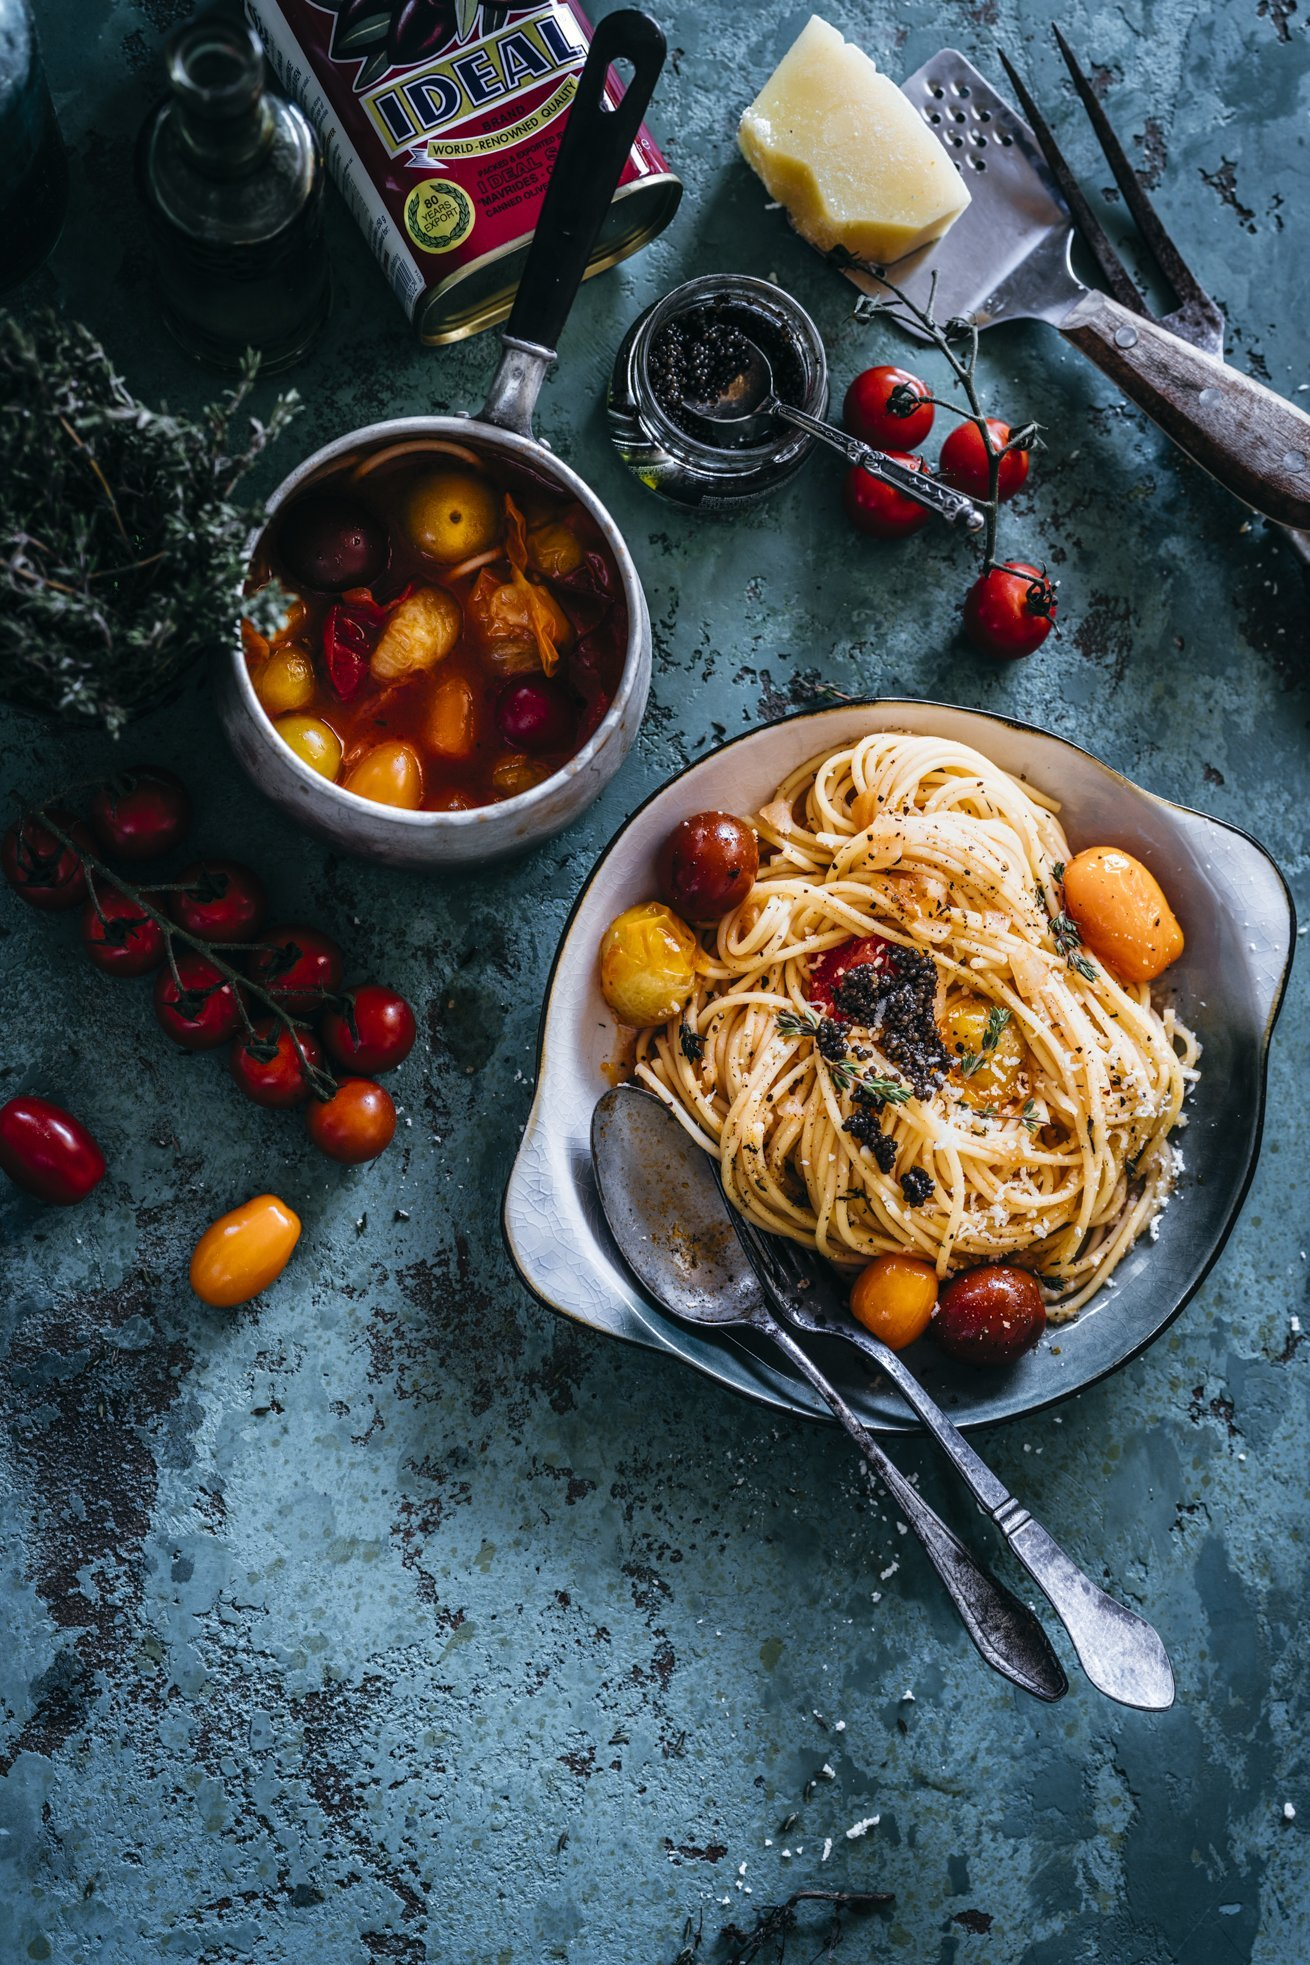 Spaghetti mit Gin Tomatensauce. So lecker!